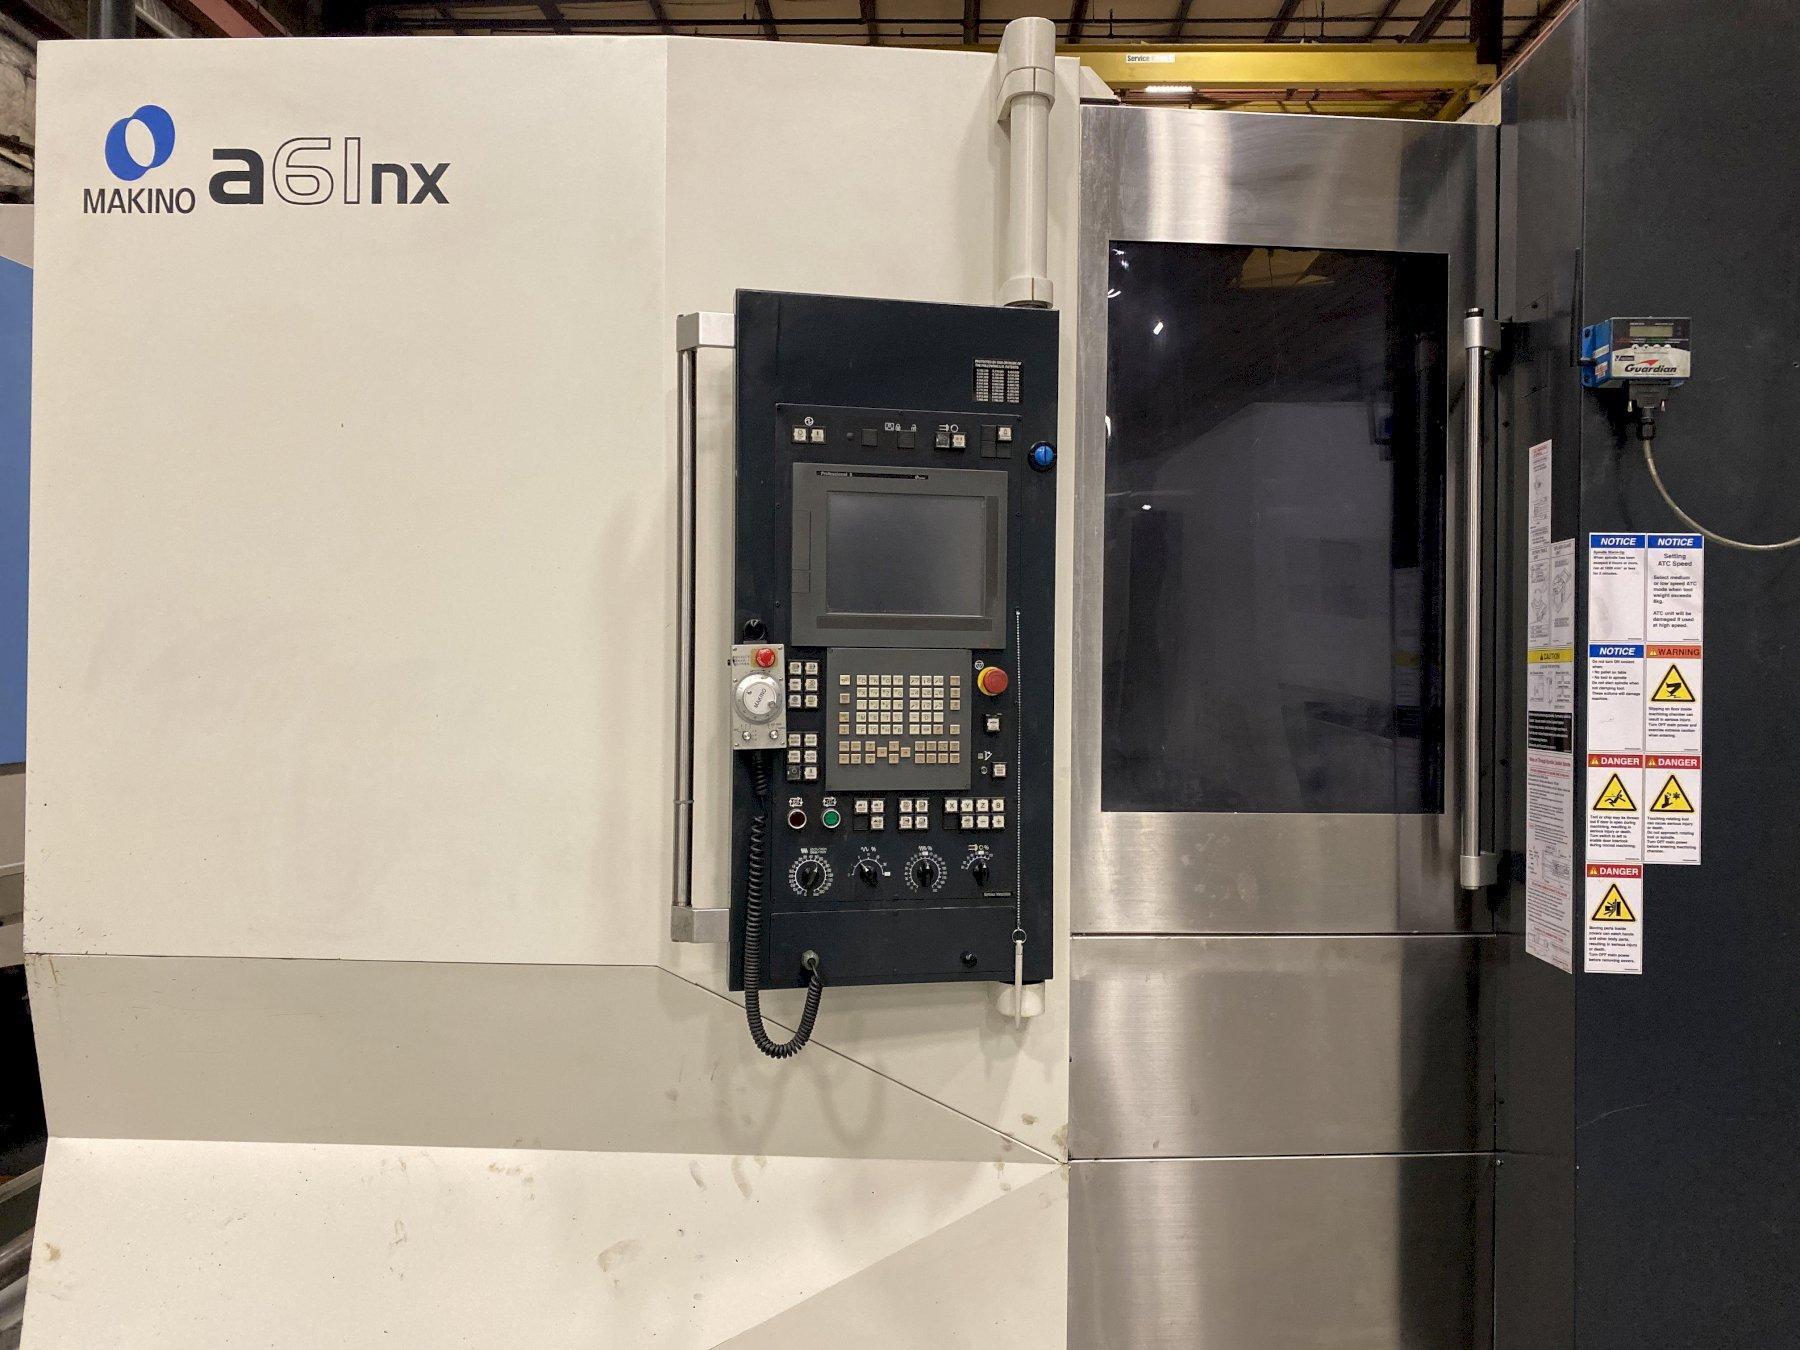 2011 Makino A61NX - CNC Horizontal Machining Center